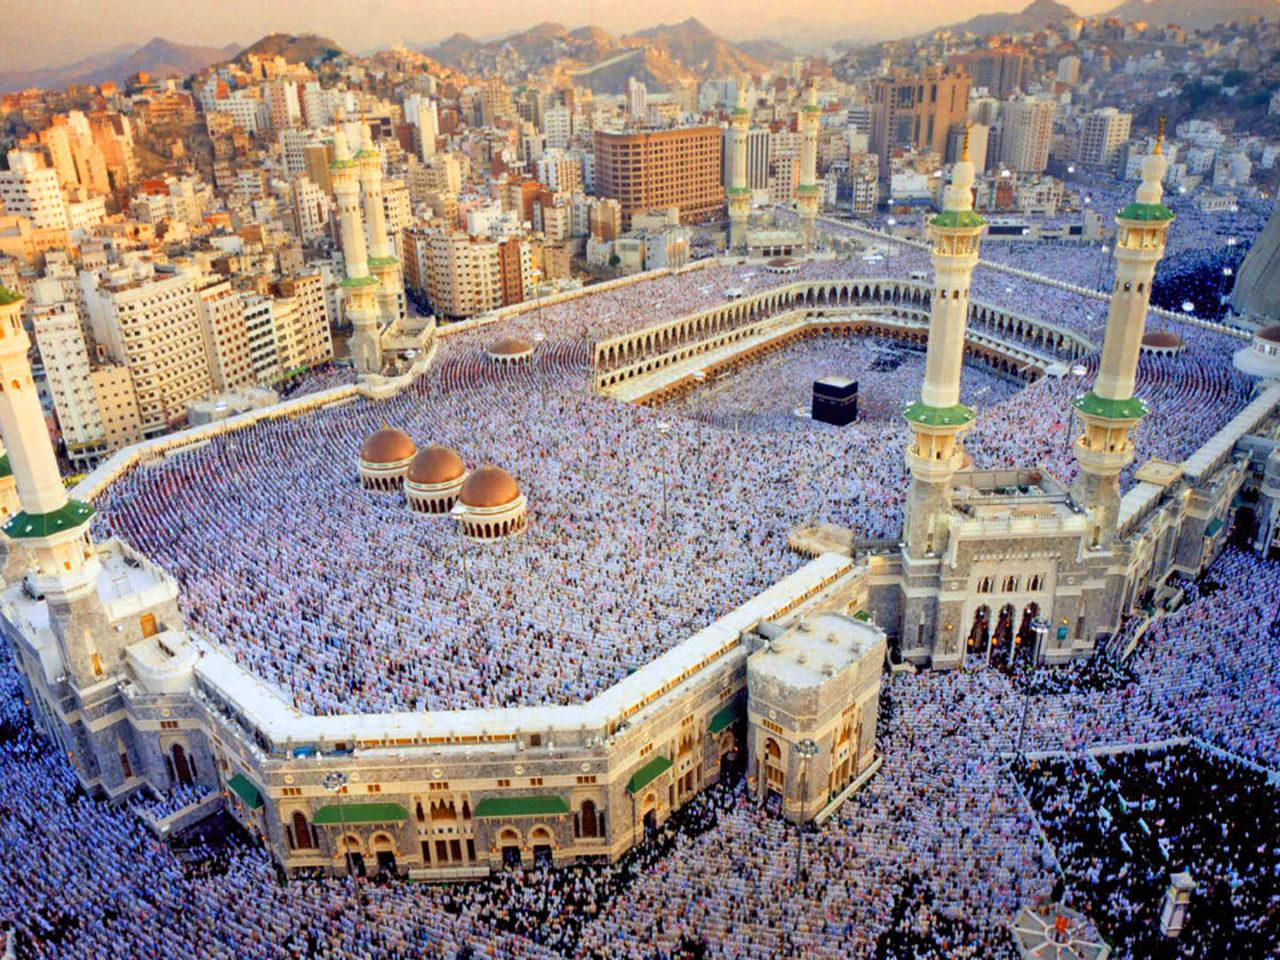 Kaaba Wallpaper Hd Al Kaaba Al Musharrafah Holy Kaaba Is A Building In The